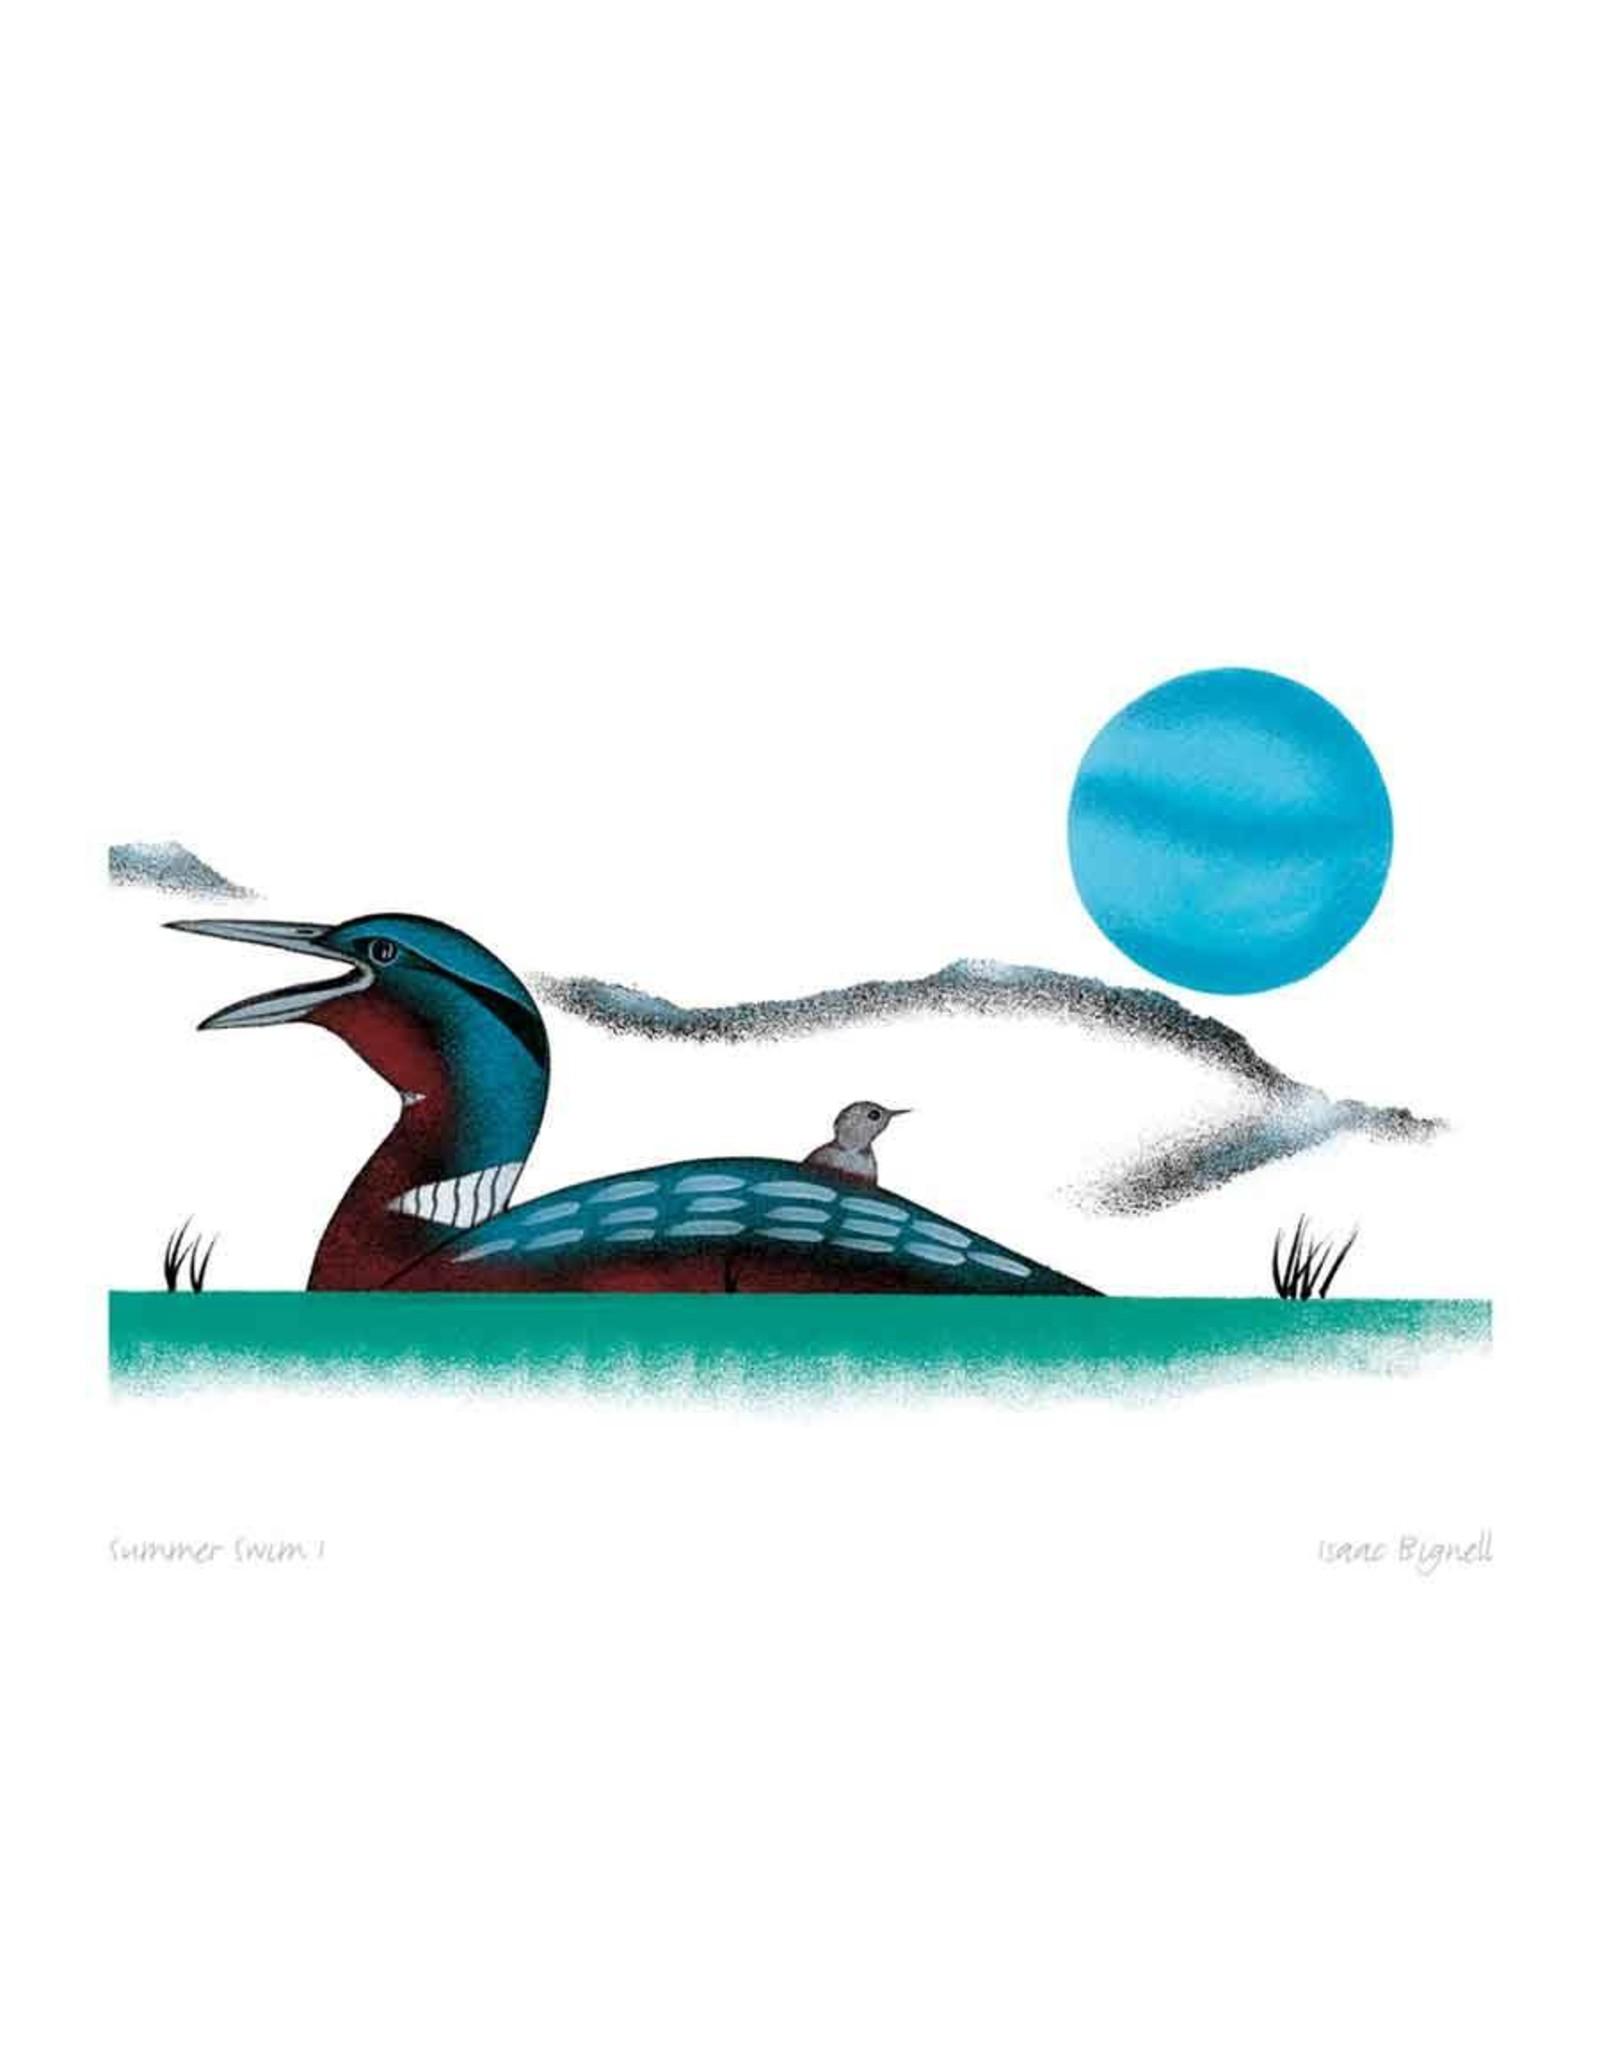 Summer Swim I by Isaac Bignell Framed